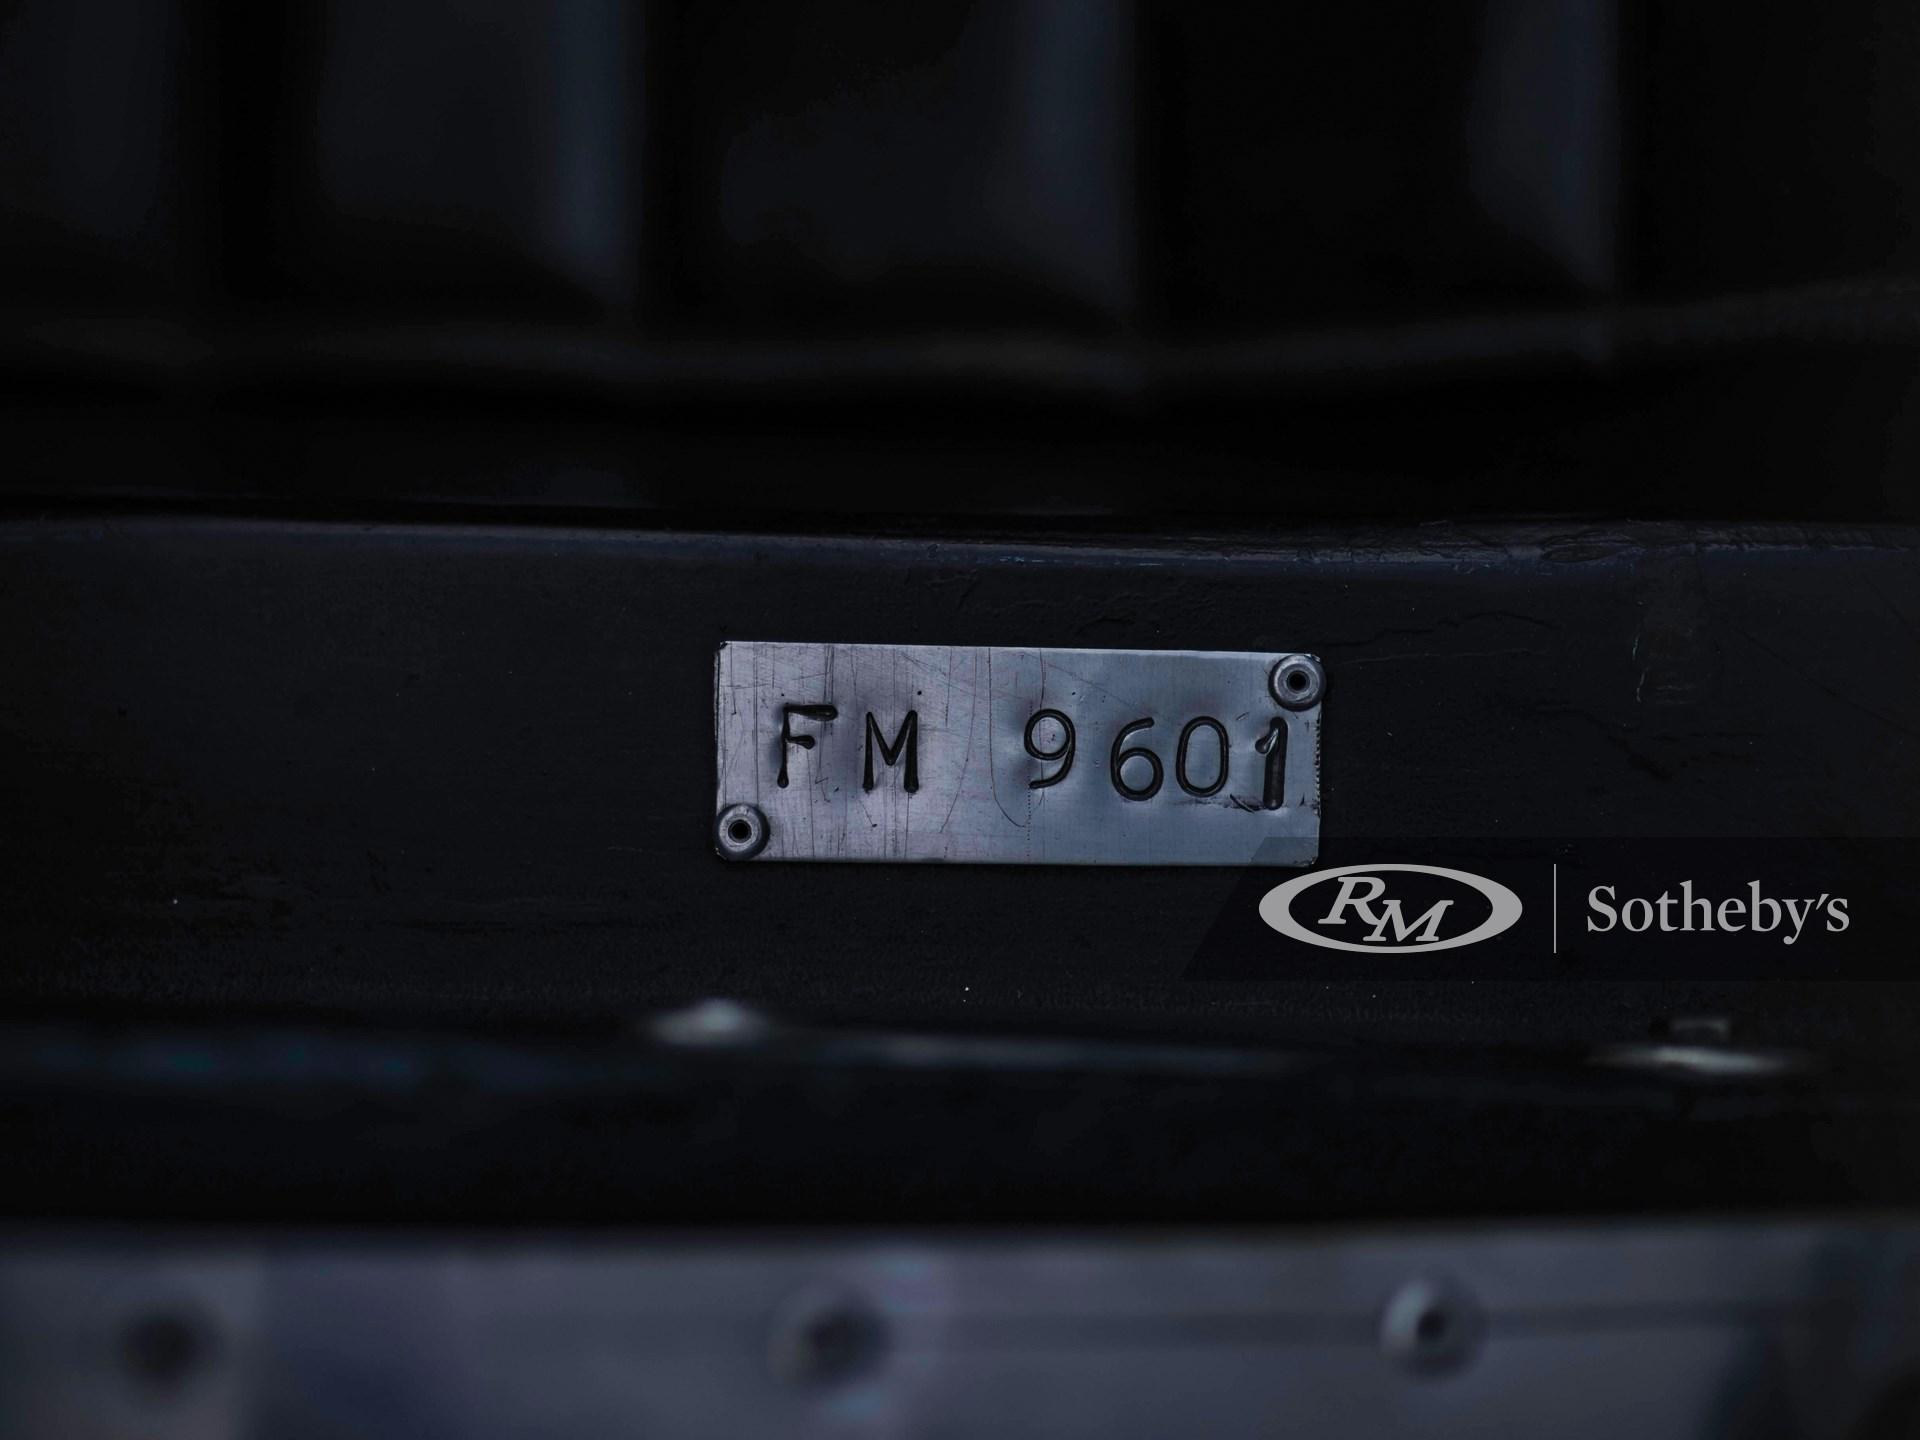 1964 Fournier-Marcadier Barquette FM 01  -